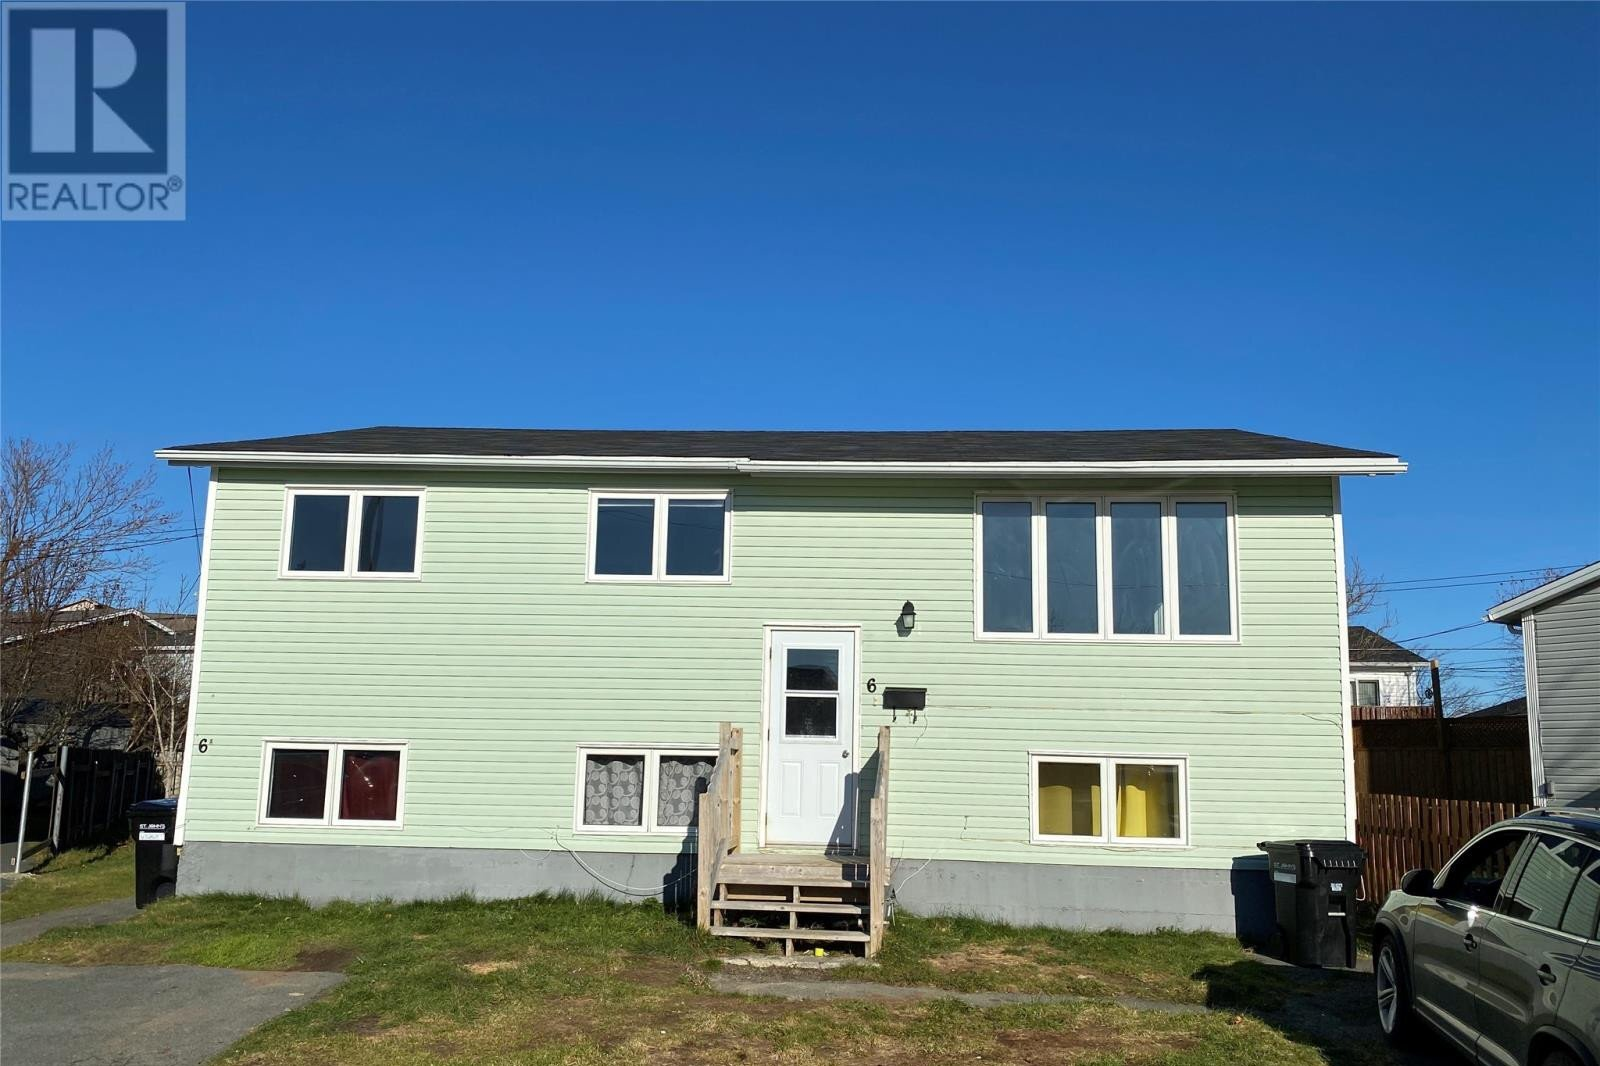 House for sale at 6 Bradshaw Pl St Johns Newfoundland - MLS: 1223704